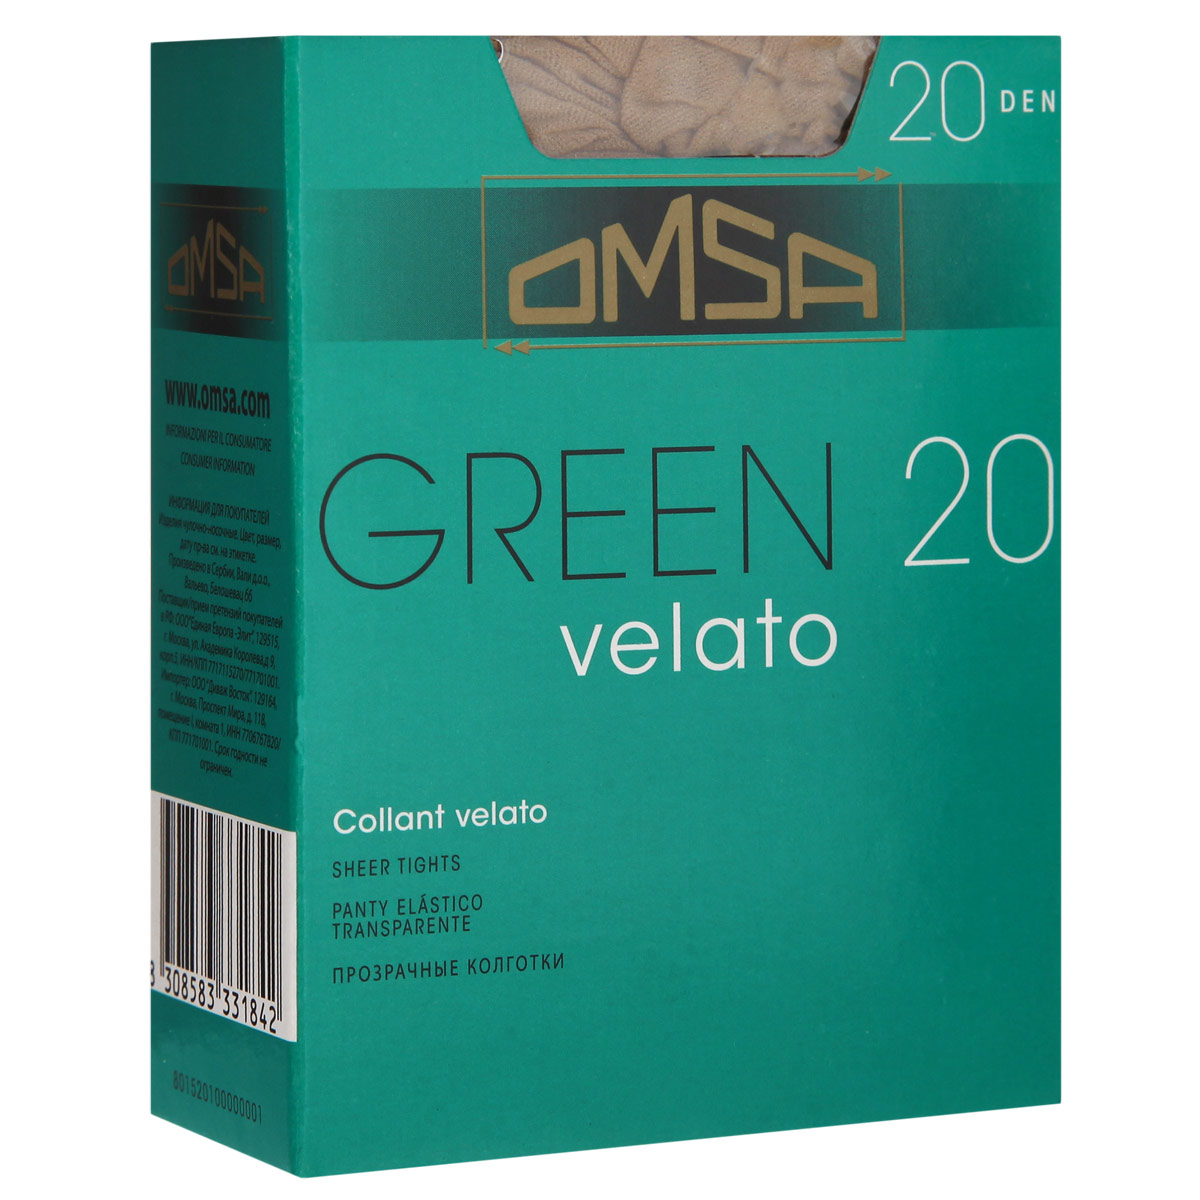 Колготки Omsa Green 20. Caramello (бледно-коричневый). Размер 4-L чулки omsa malizia размер 4 плотность 20 den caramello